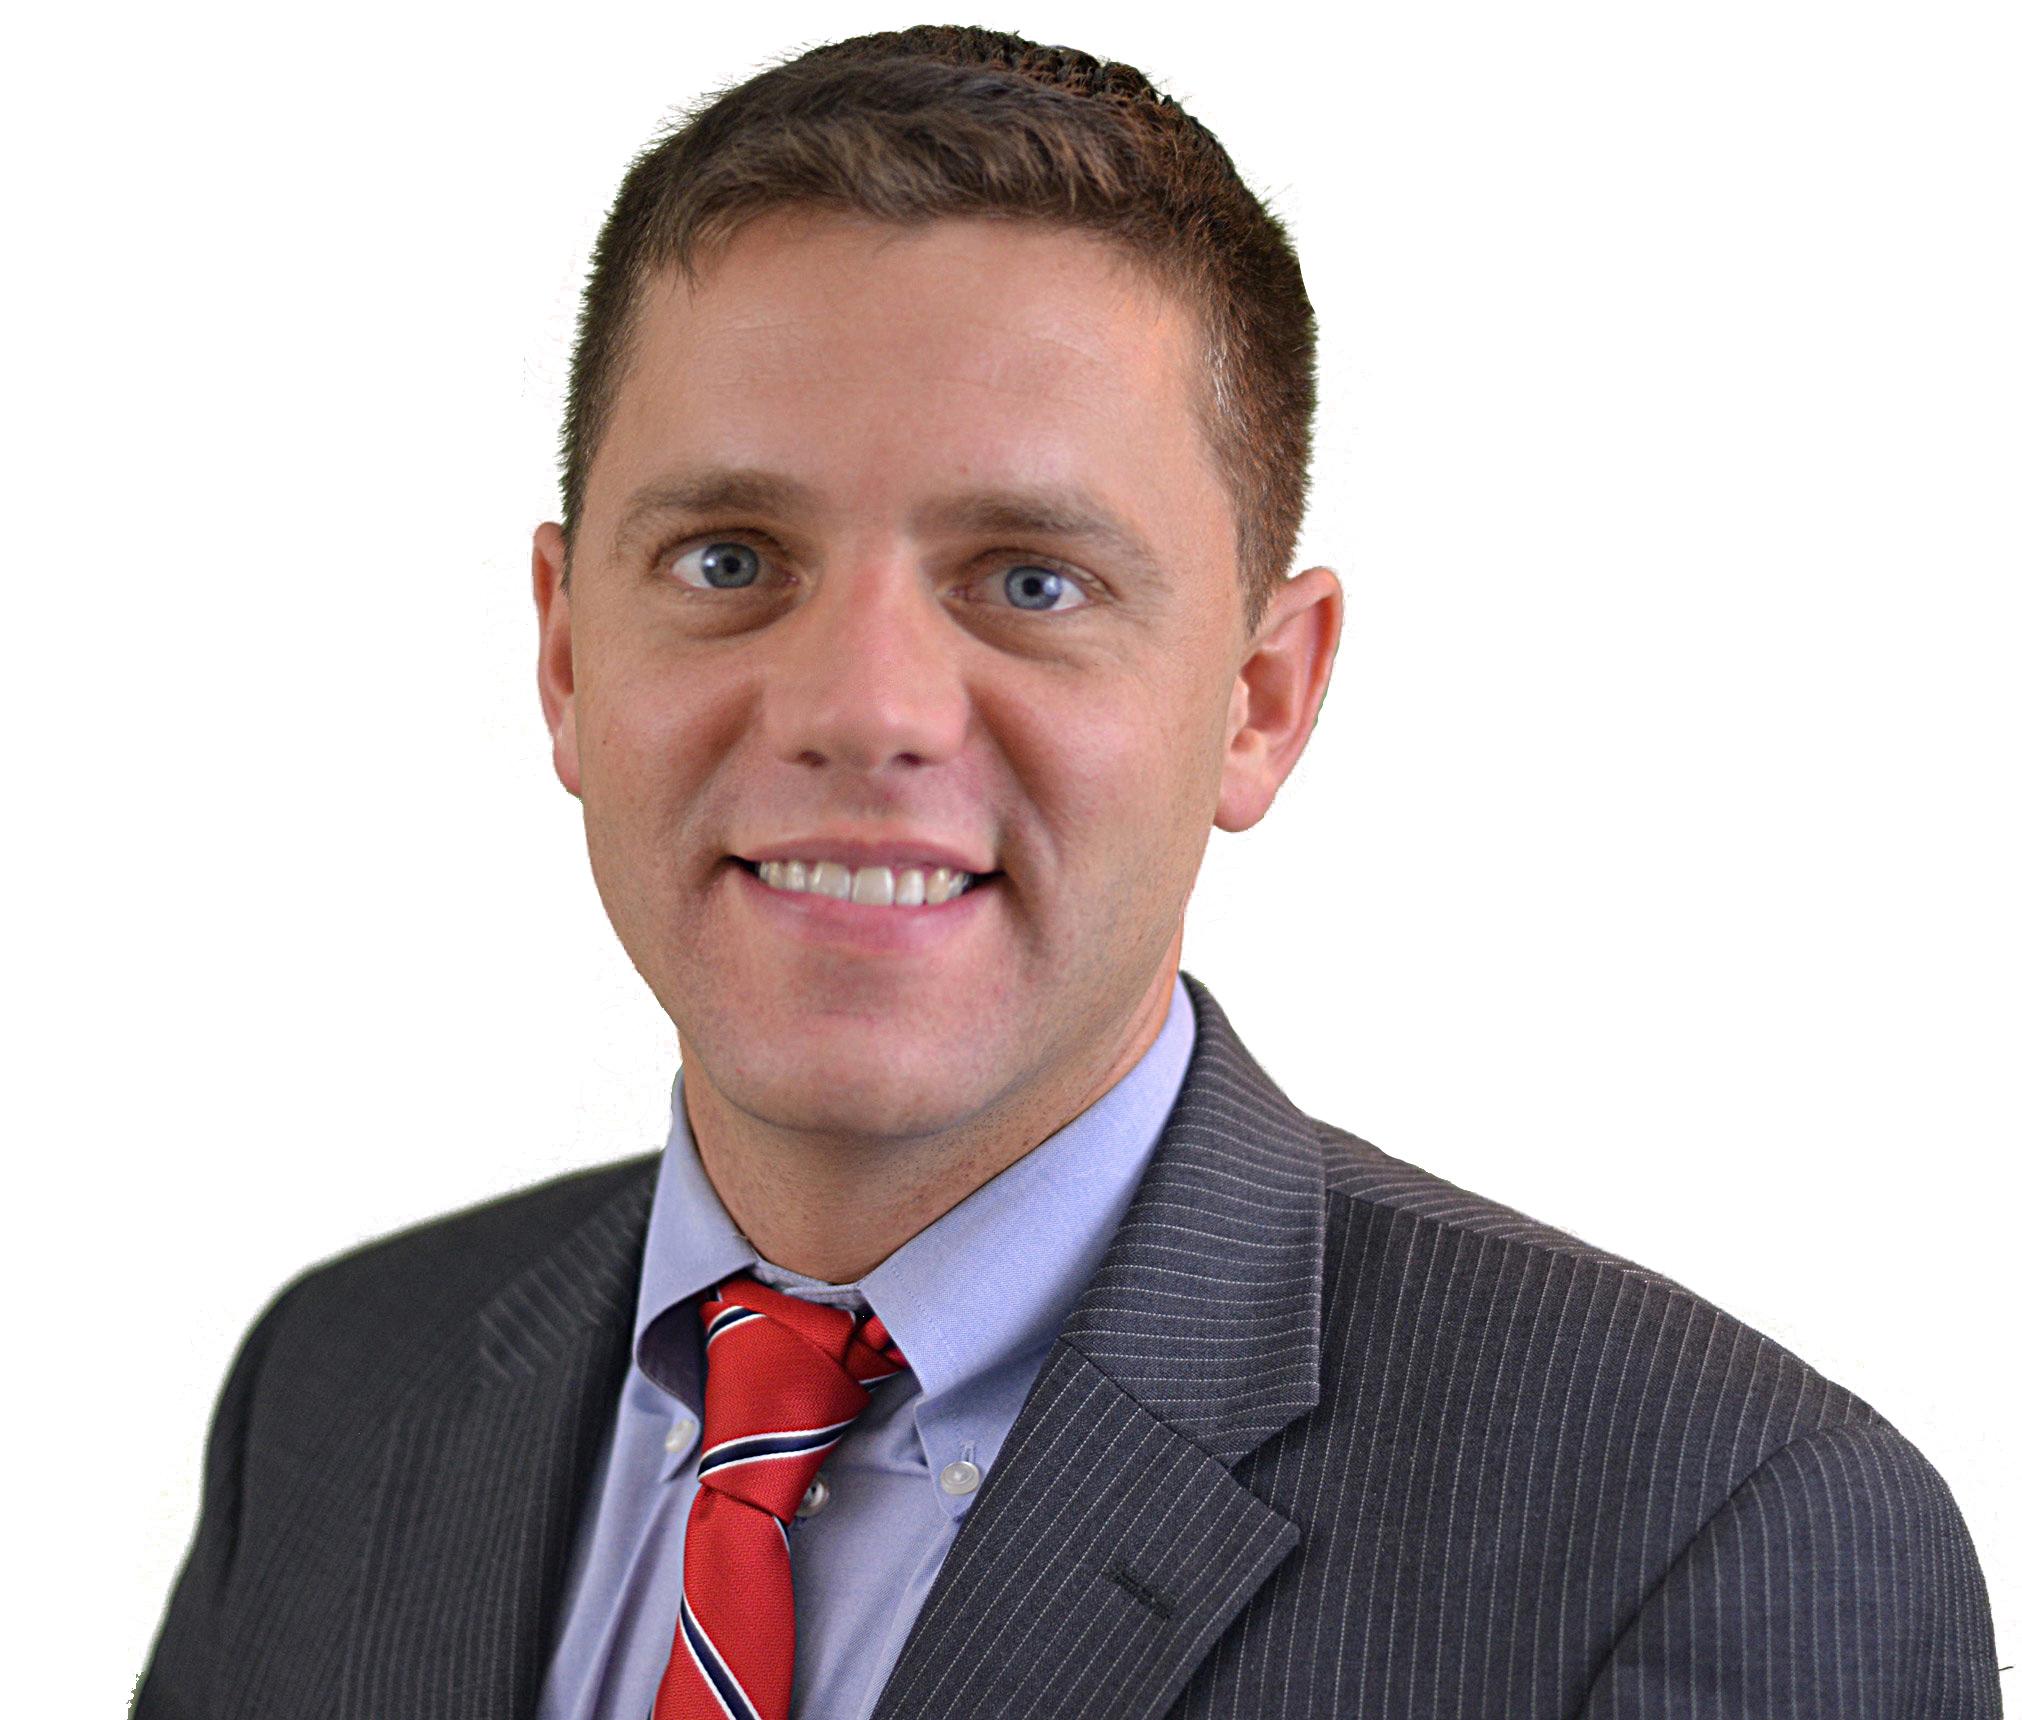 Rep. John C. Velis - Democrat - 4th Hampden(413) 572-3920